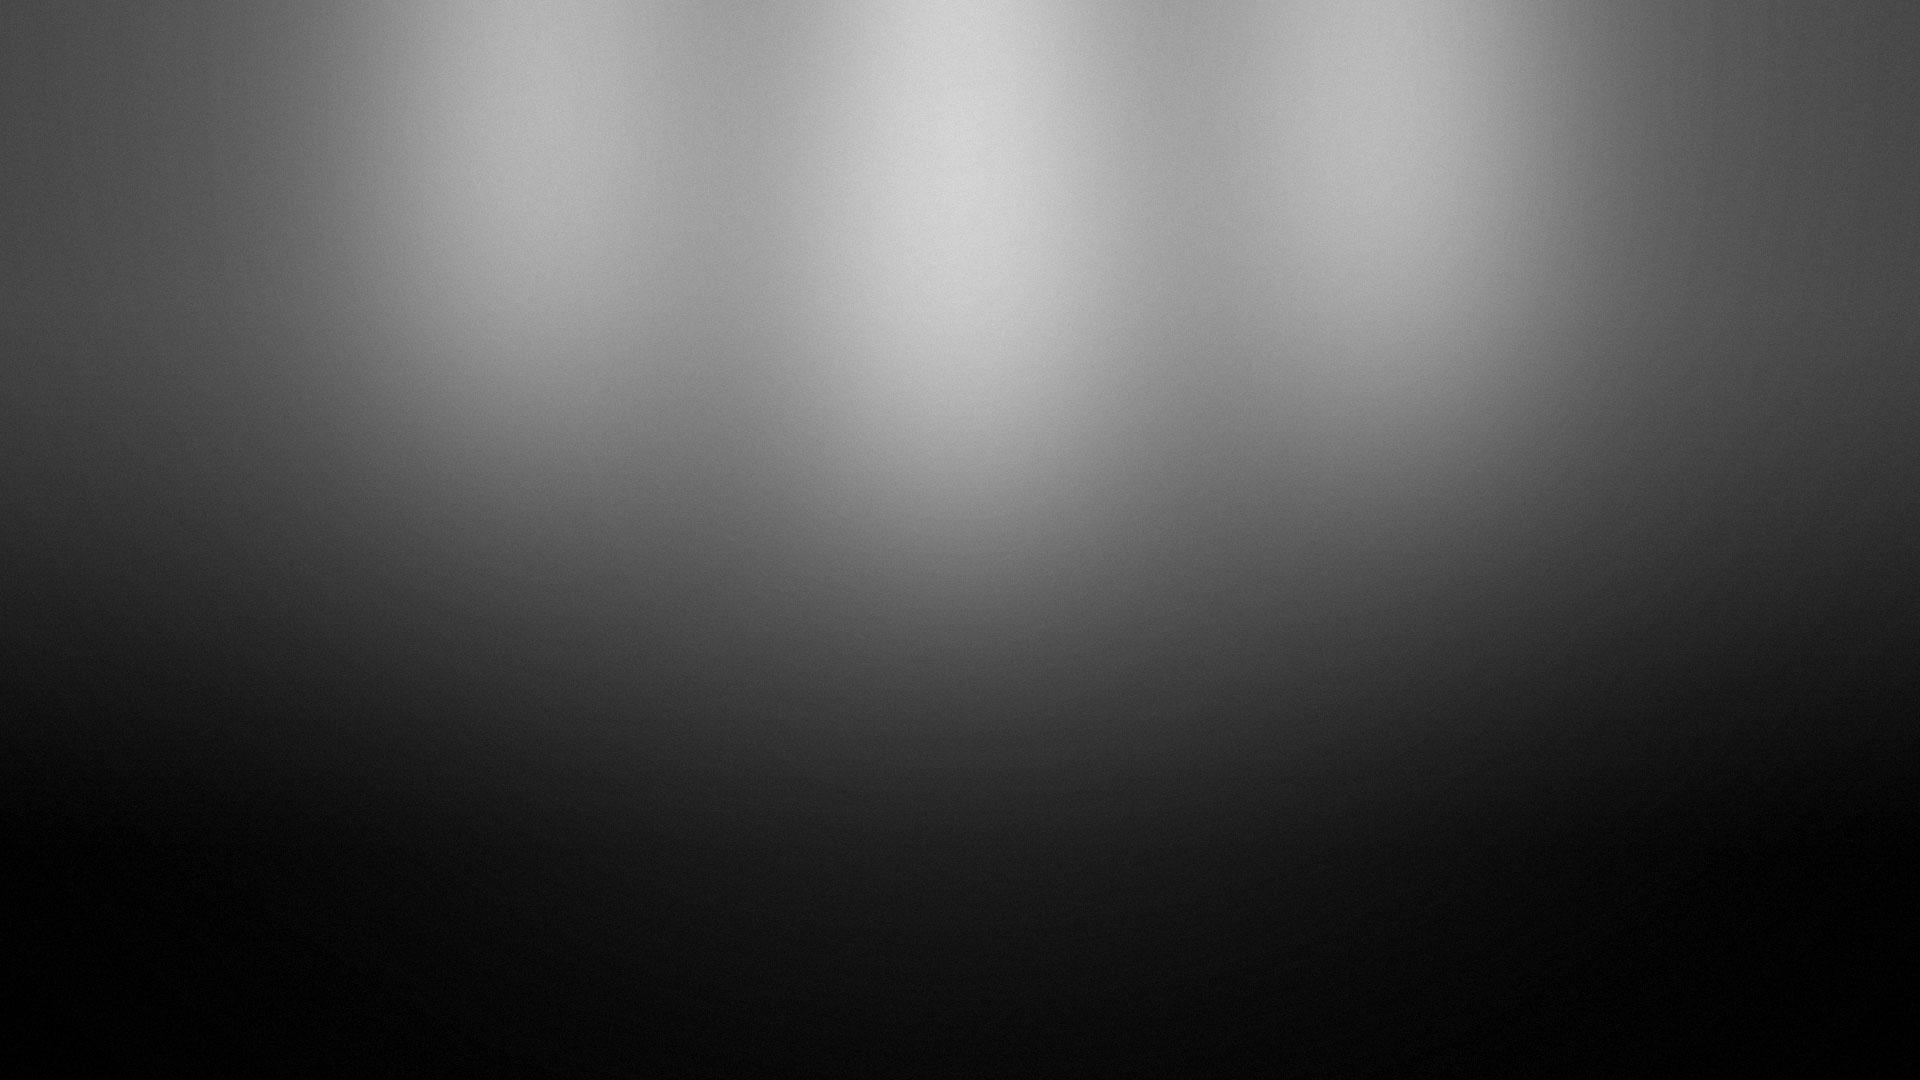 Black Background Phone 2017   Live Wallpaper HD 1920x1080